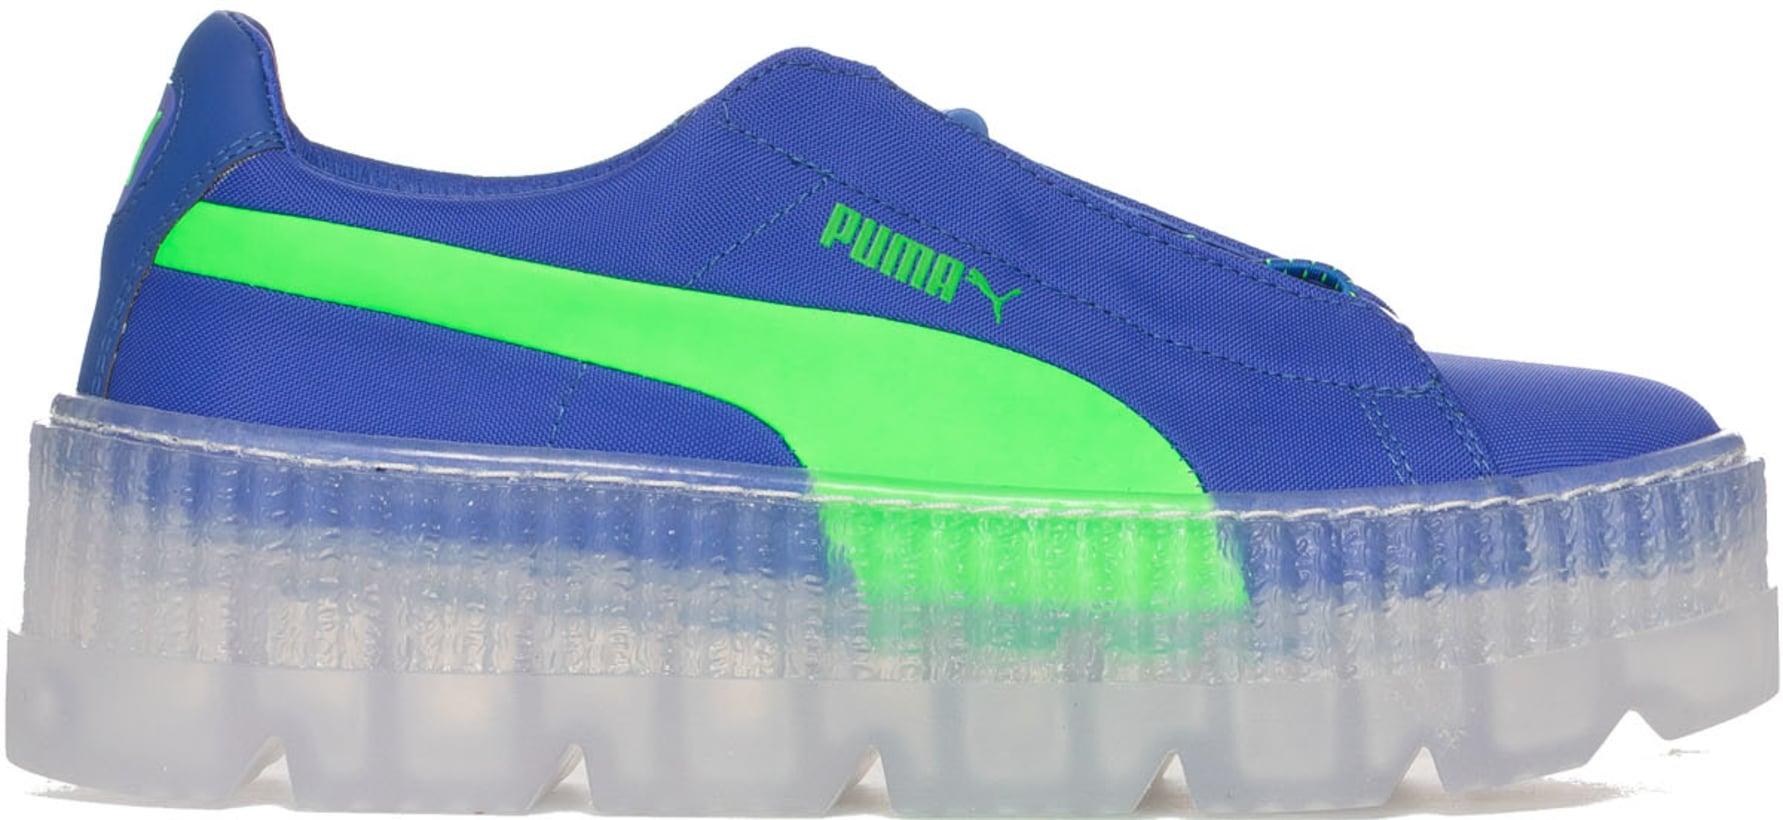 best loved 8f2f0 9f817 Puma - Cleated Creeper Surf - Dazzling Blue/Green Gecko